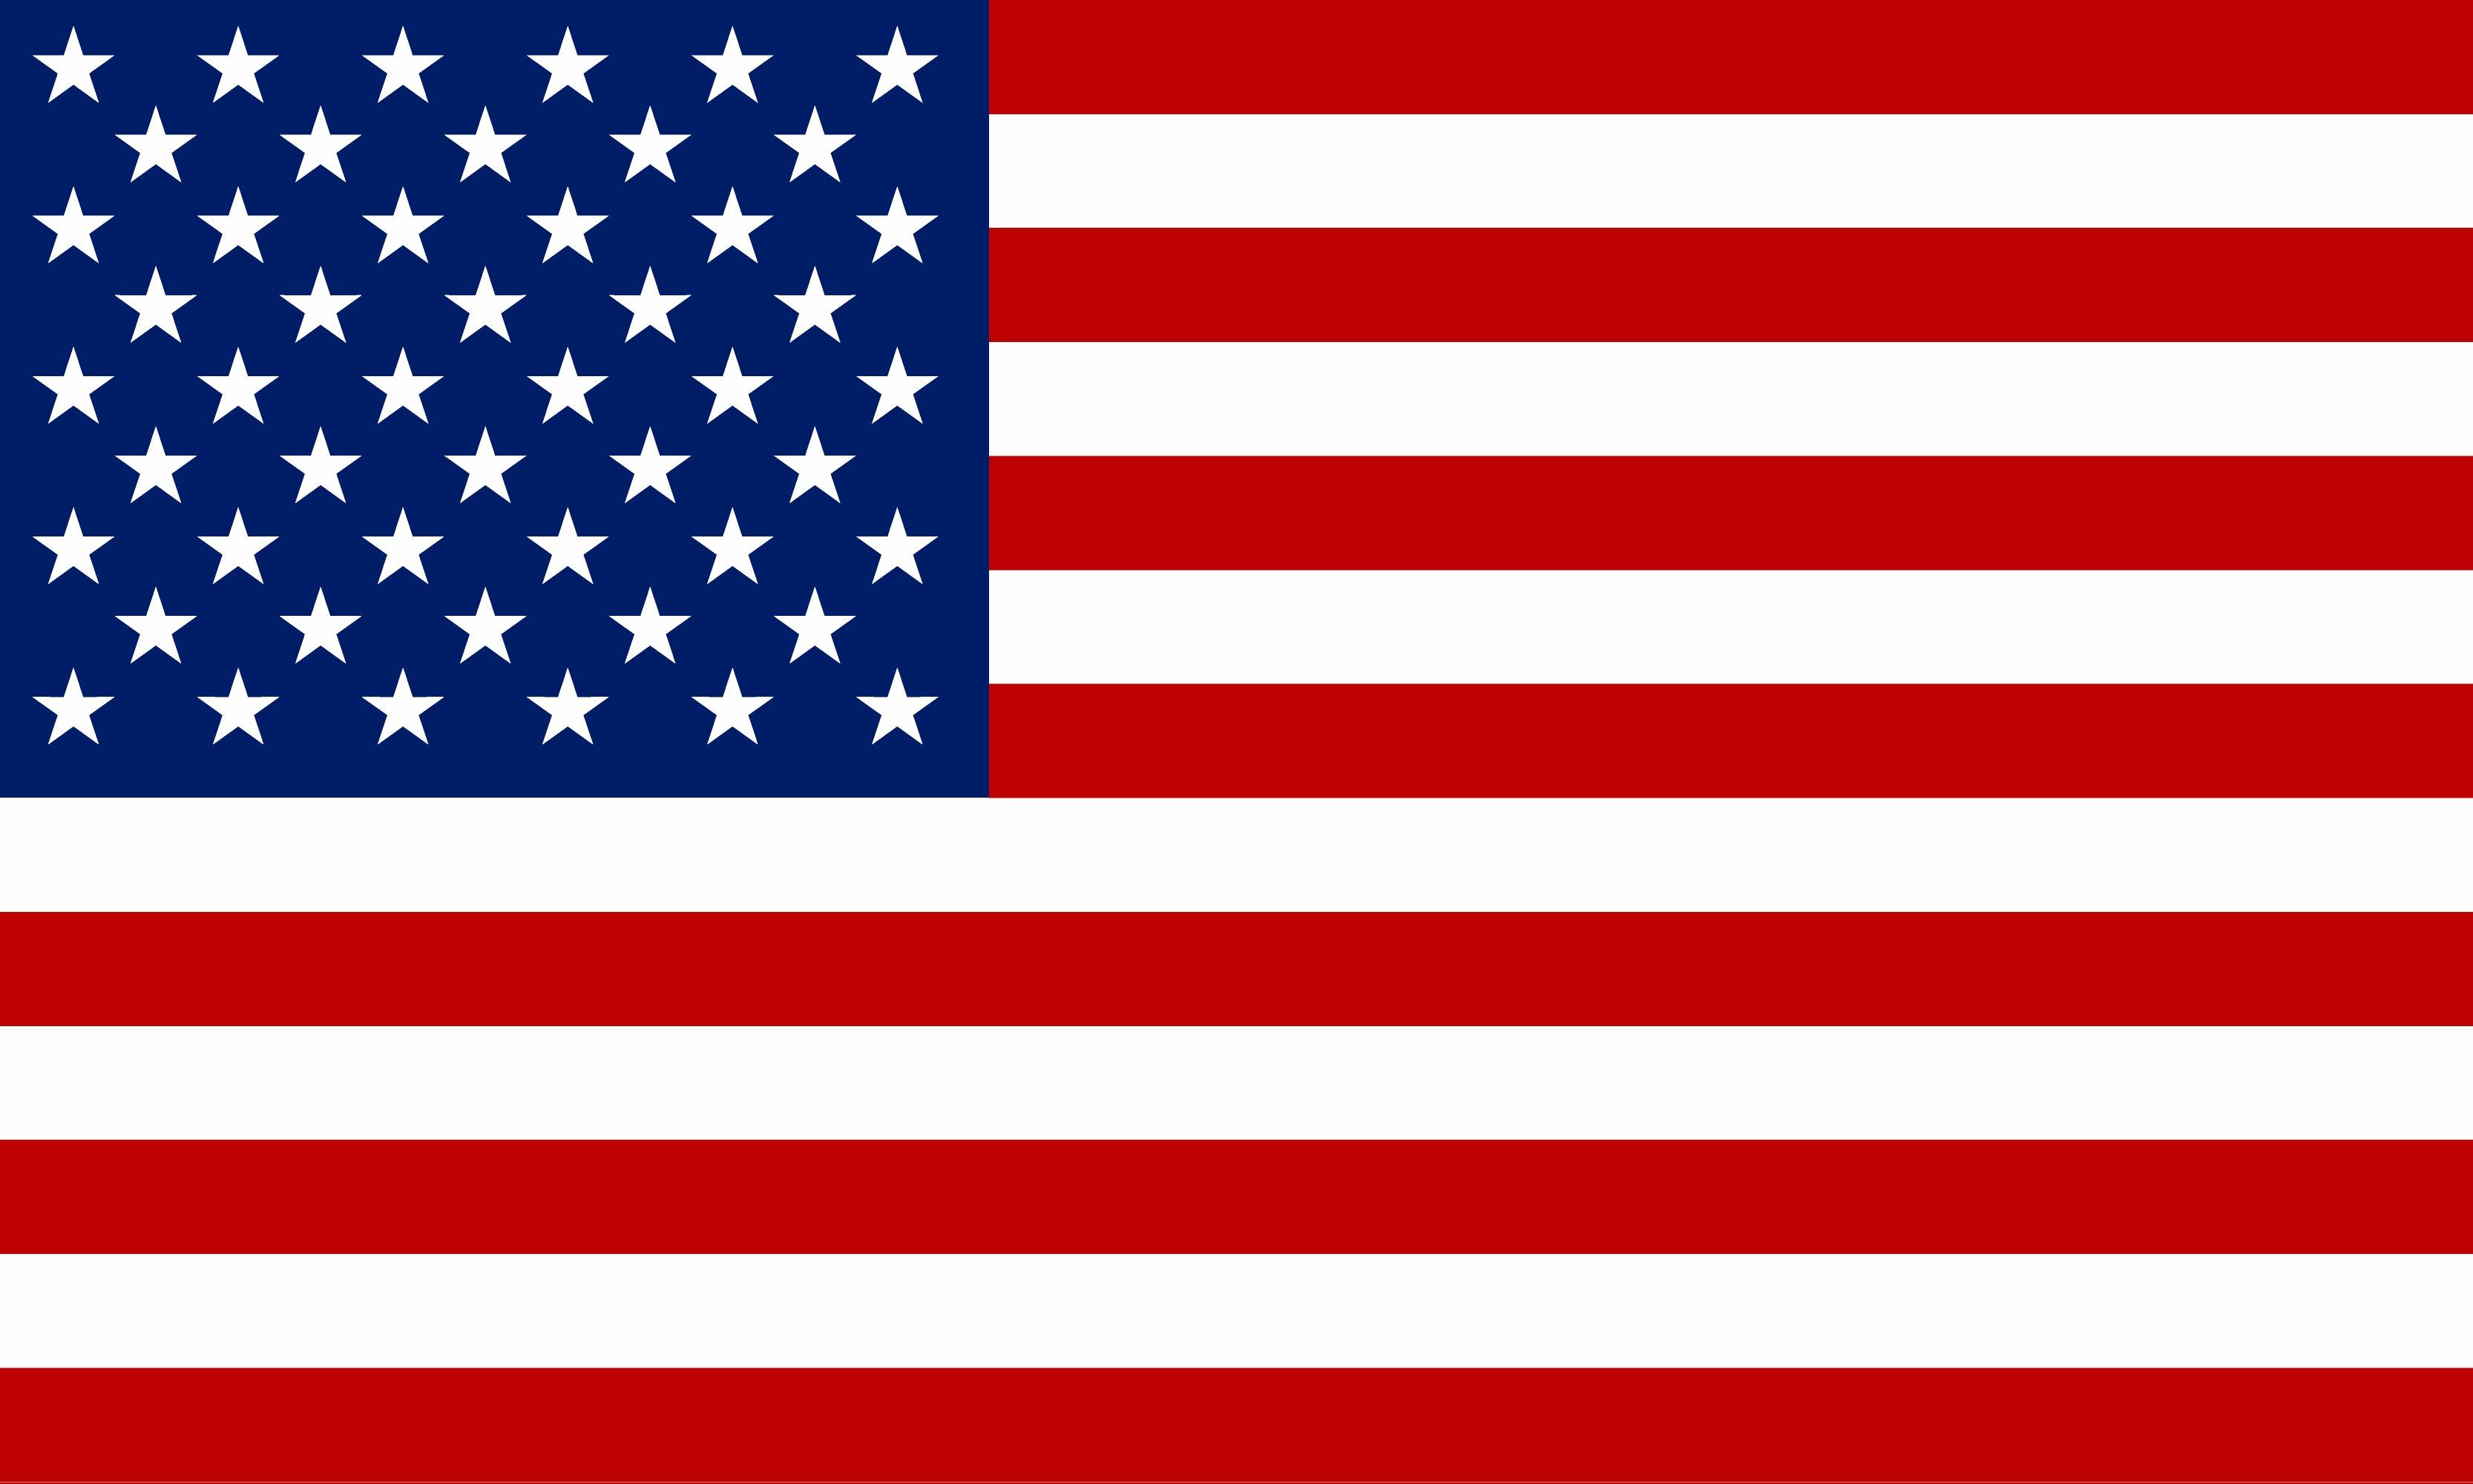 United states of america flag.jpg